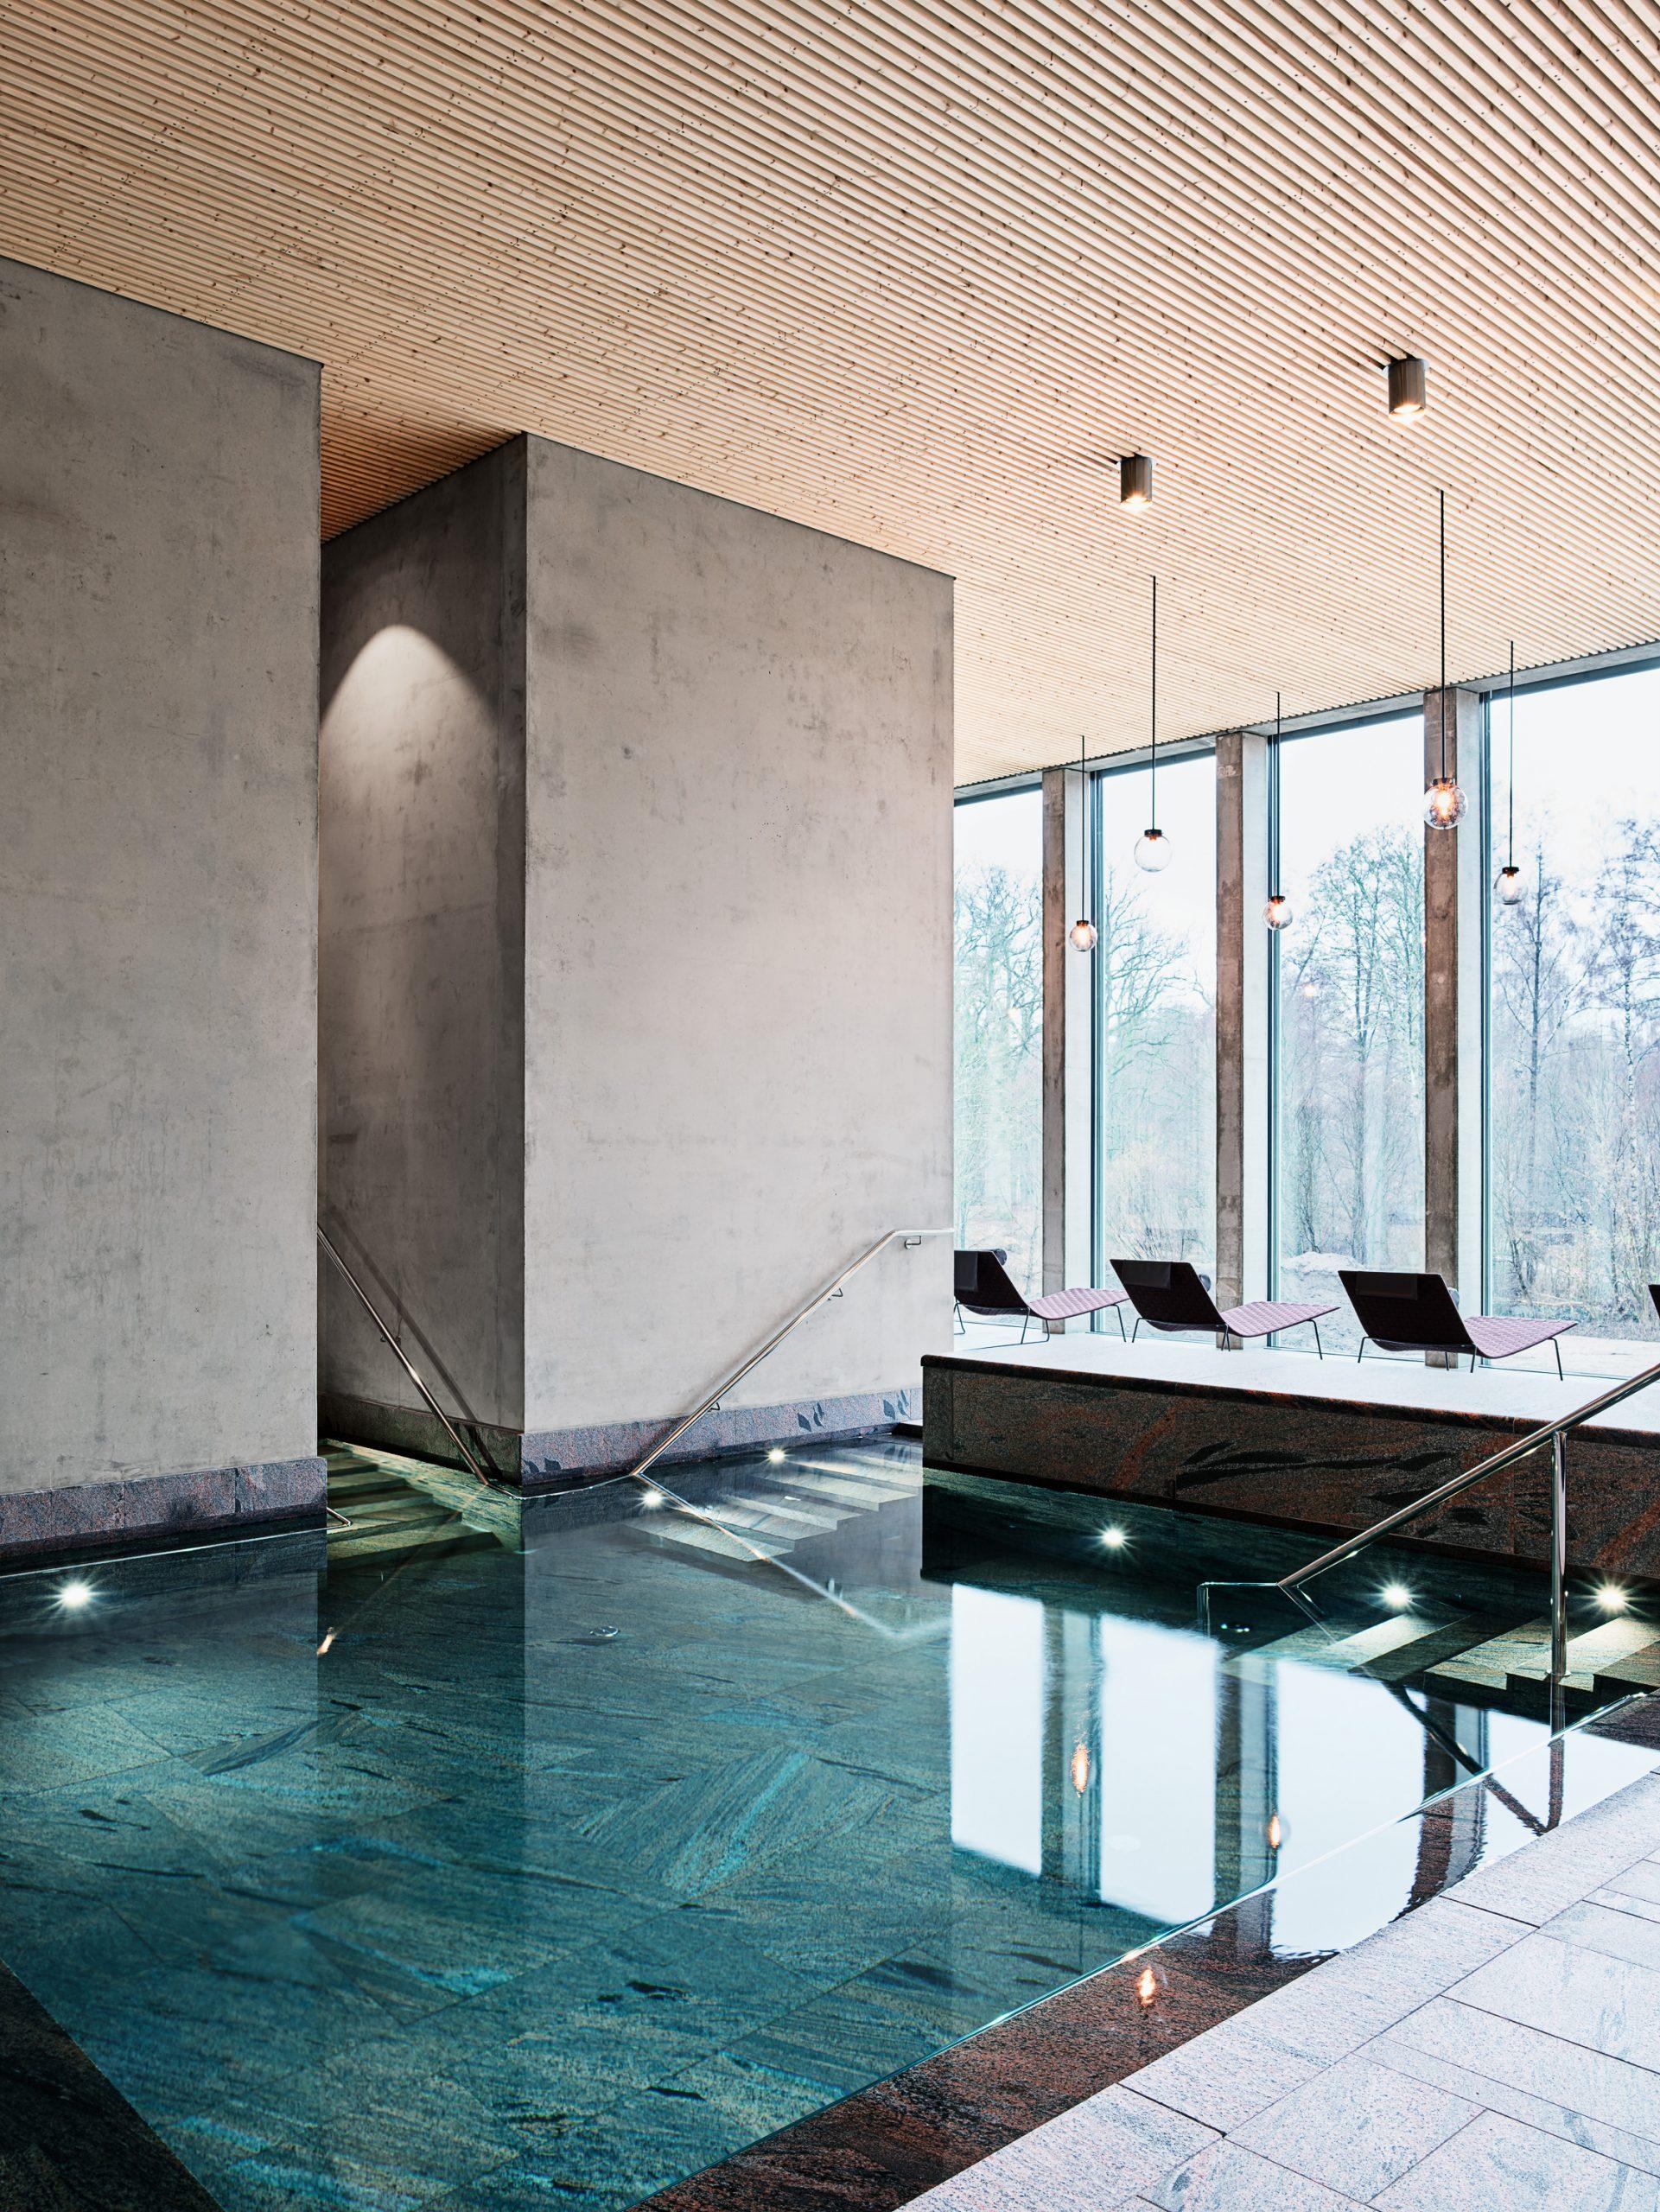 Chief Architects:  Johan Sundberg, Mattias Andreasson (Blasberg Andreasson Architects) / Associate Architect:  Henrik Ålund